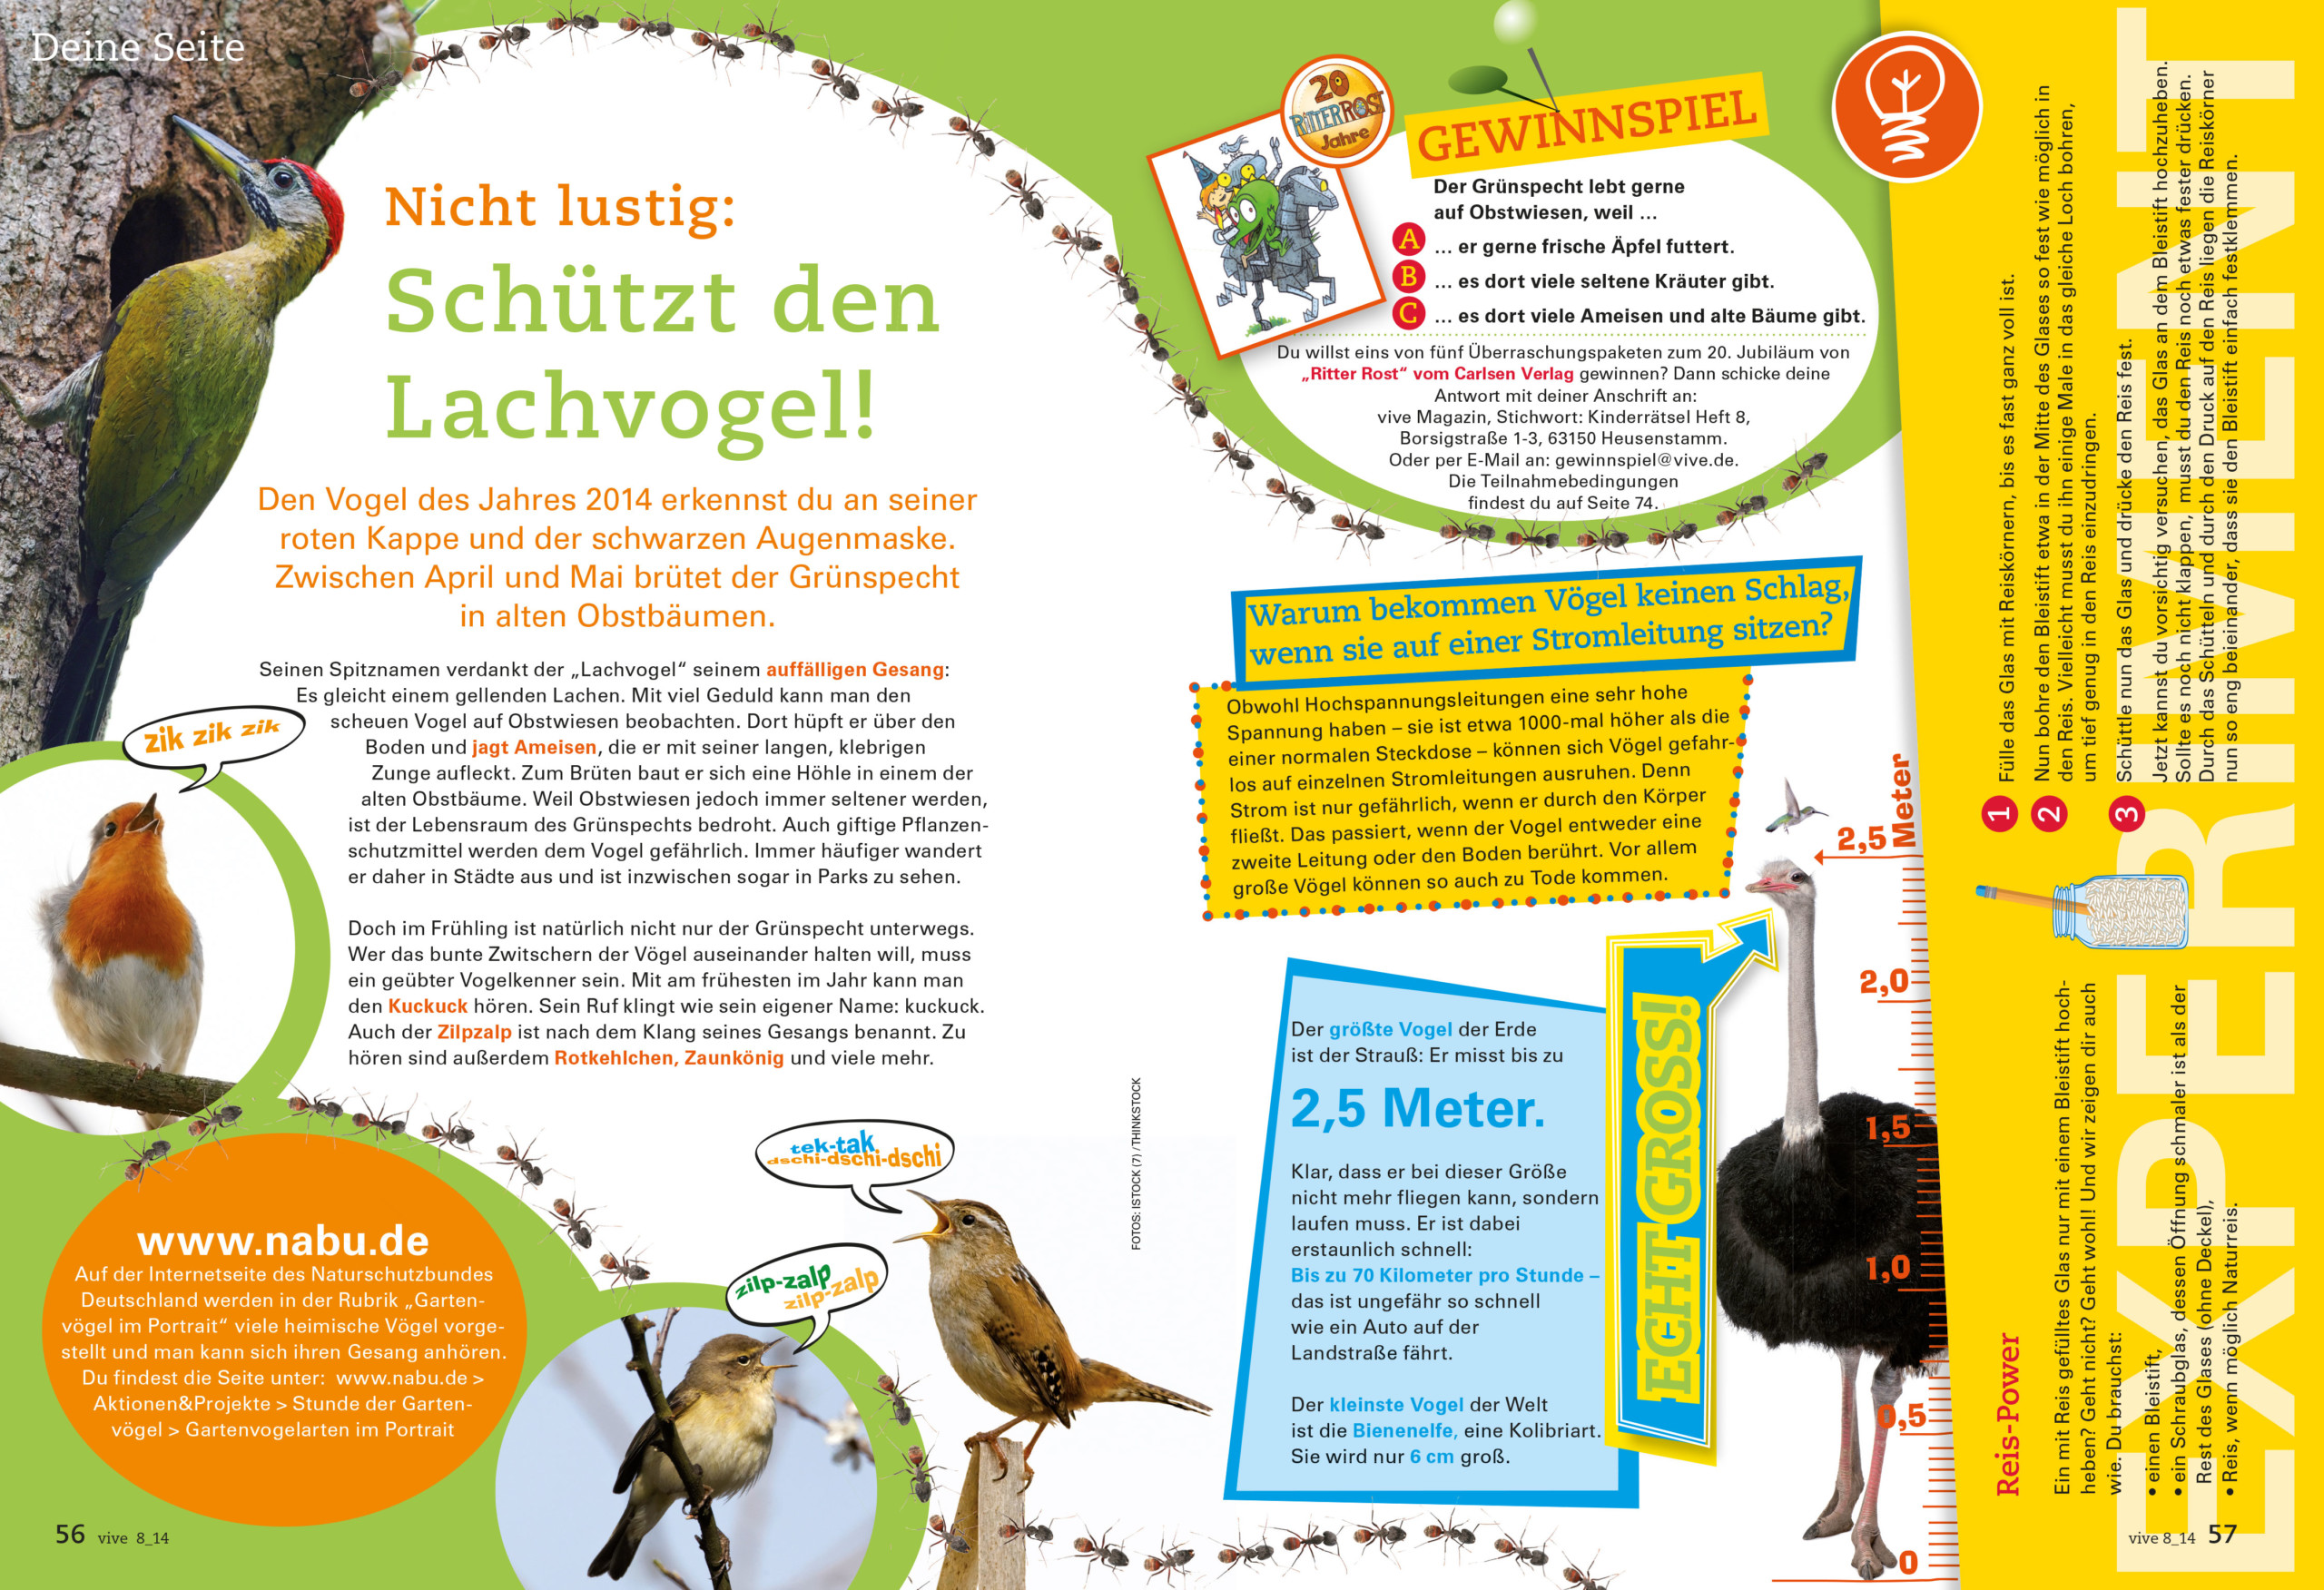 VIVE / ALPHEGA Kundenmagazin – Kinderseiten -Thema Vögel